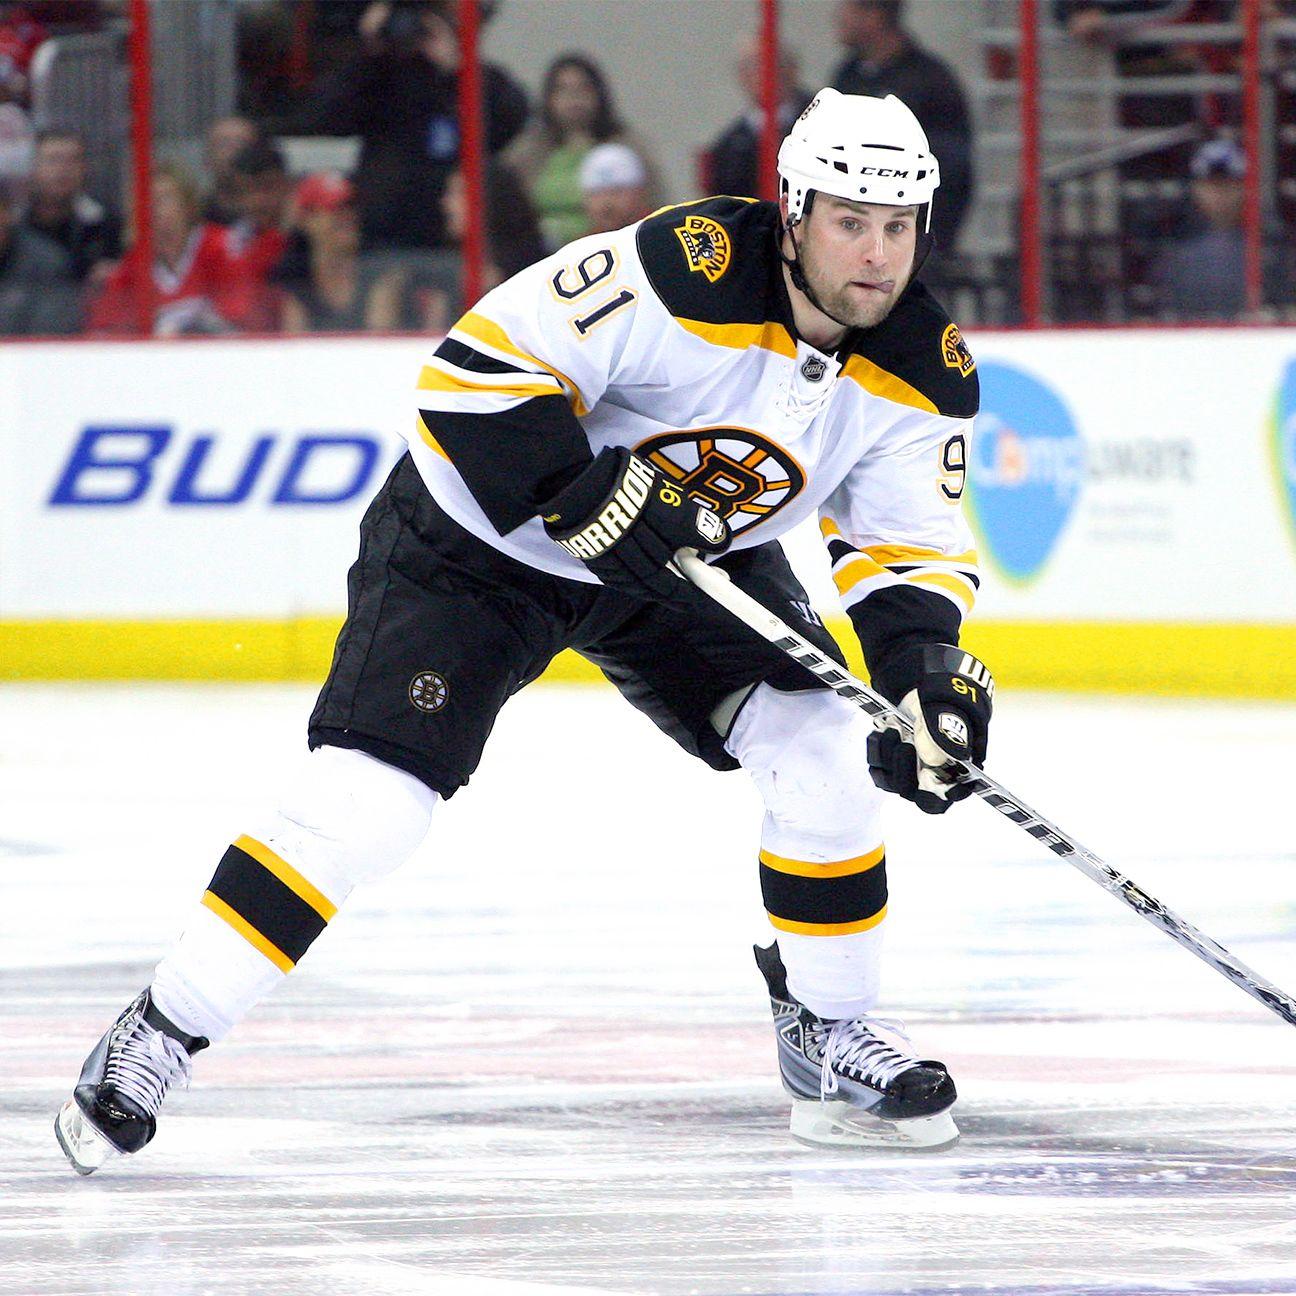 Bruins, Savard Officially Part Ways